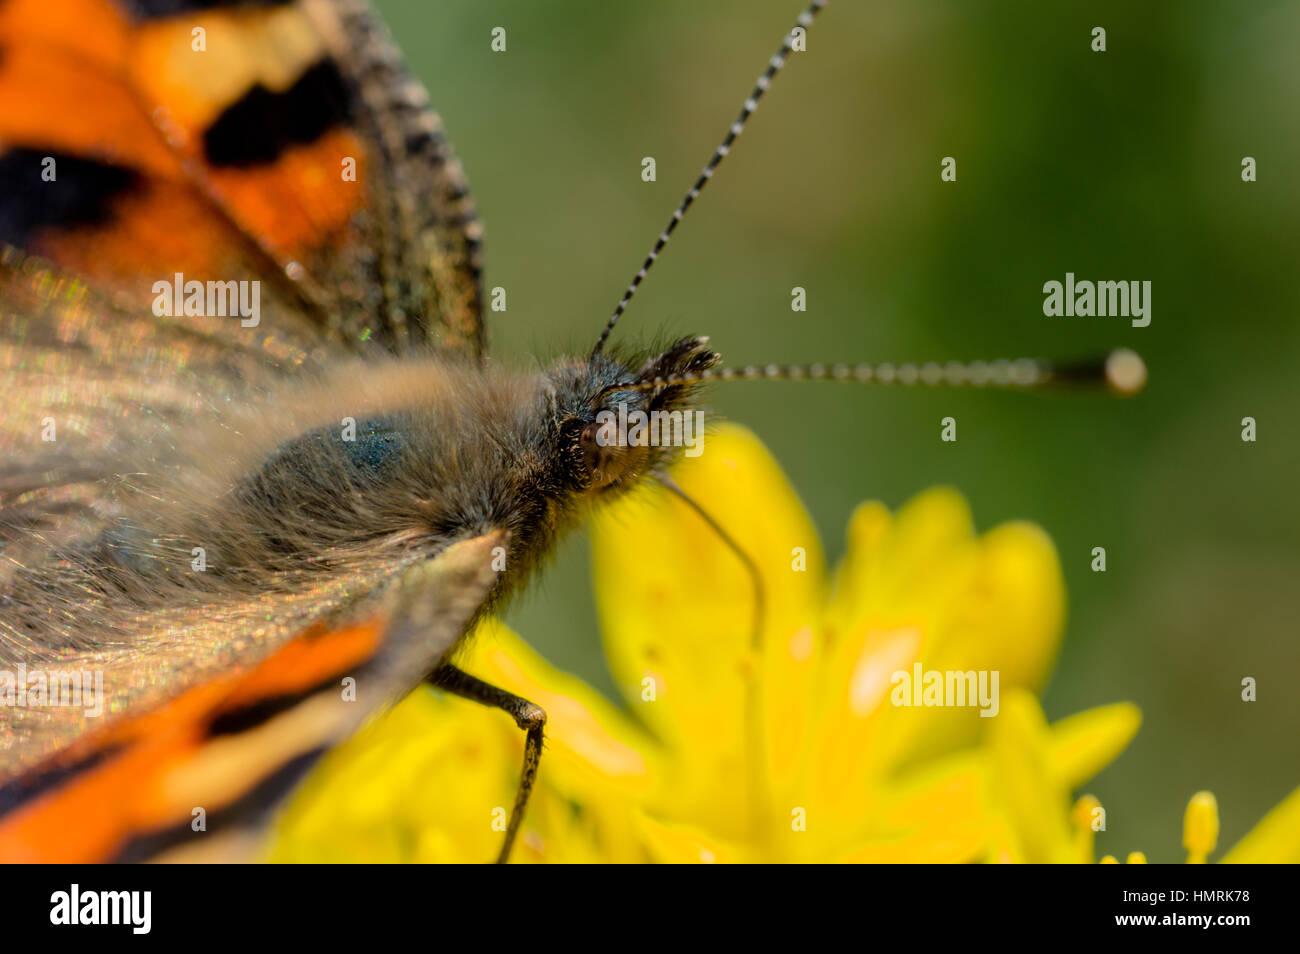 Insect Garden Macro - Stock Image